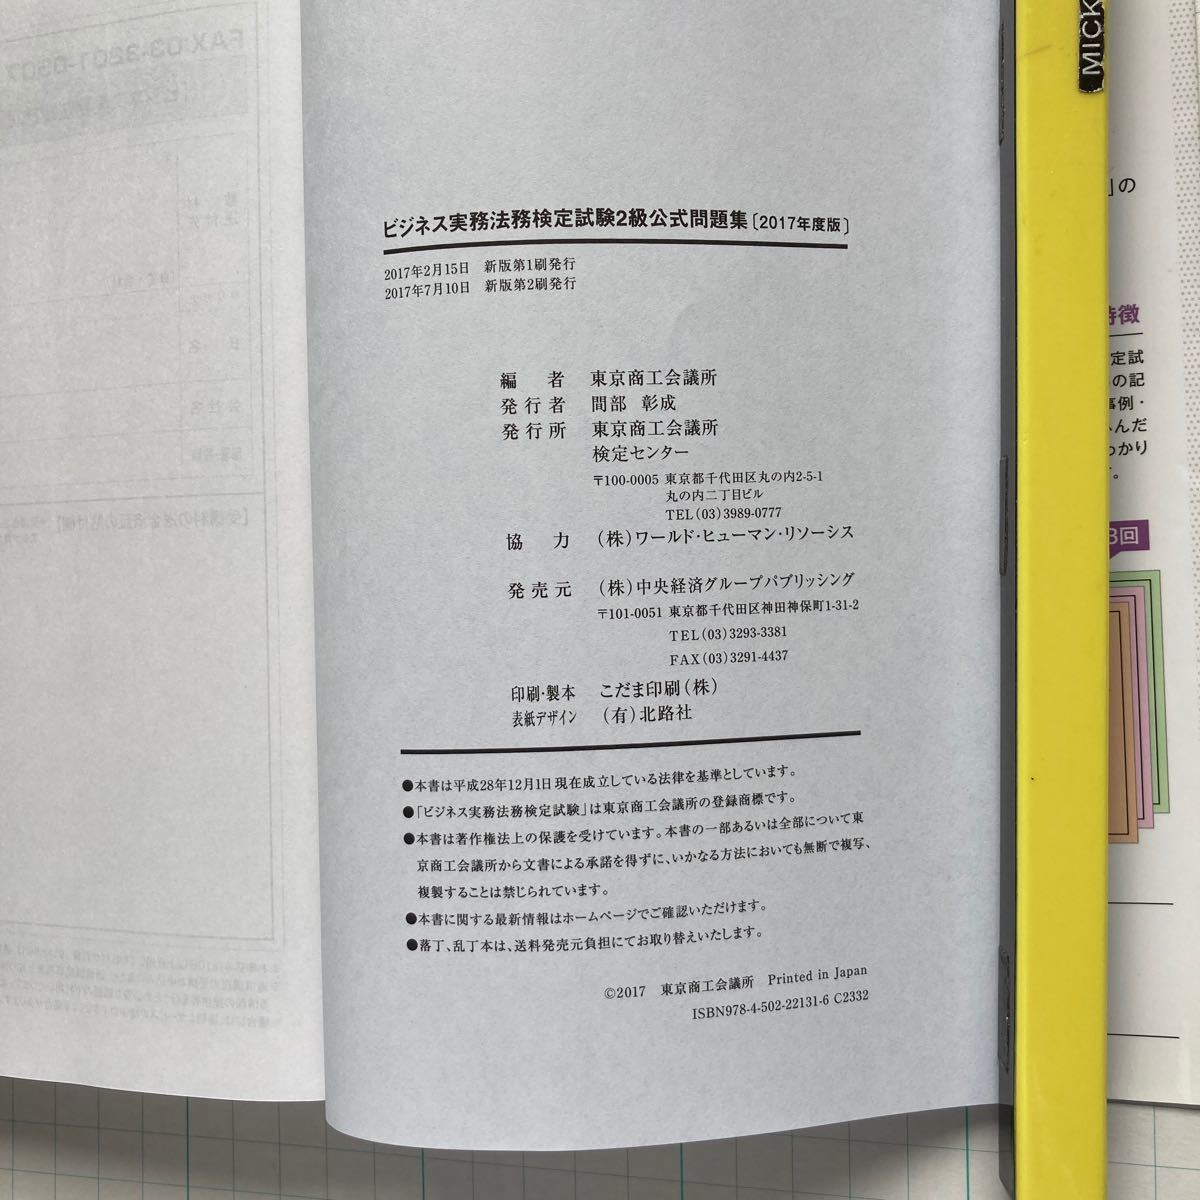 ビジネス実務法務検定試験2級公式問題集 (2017年度版) 東京商工会議所検定センター